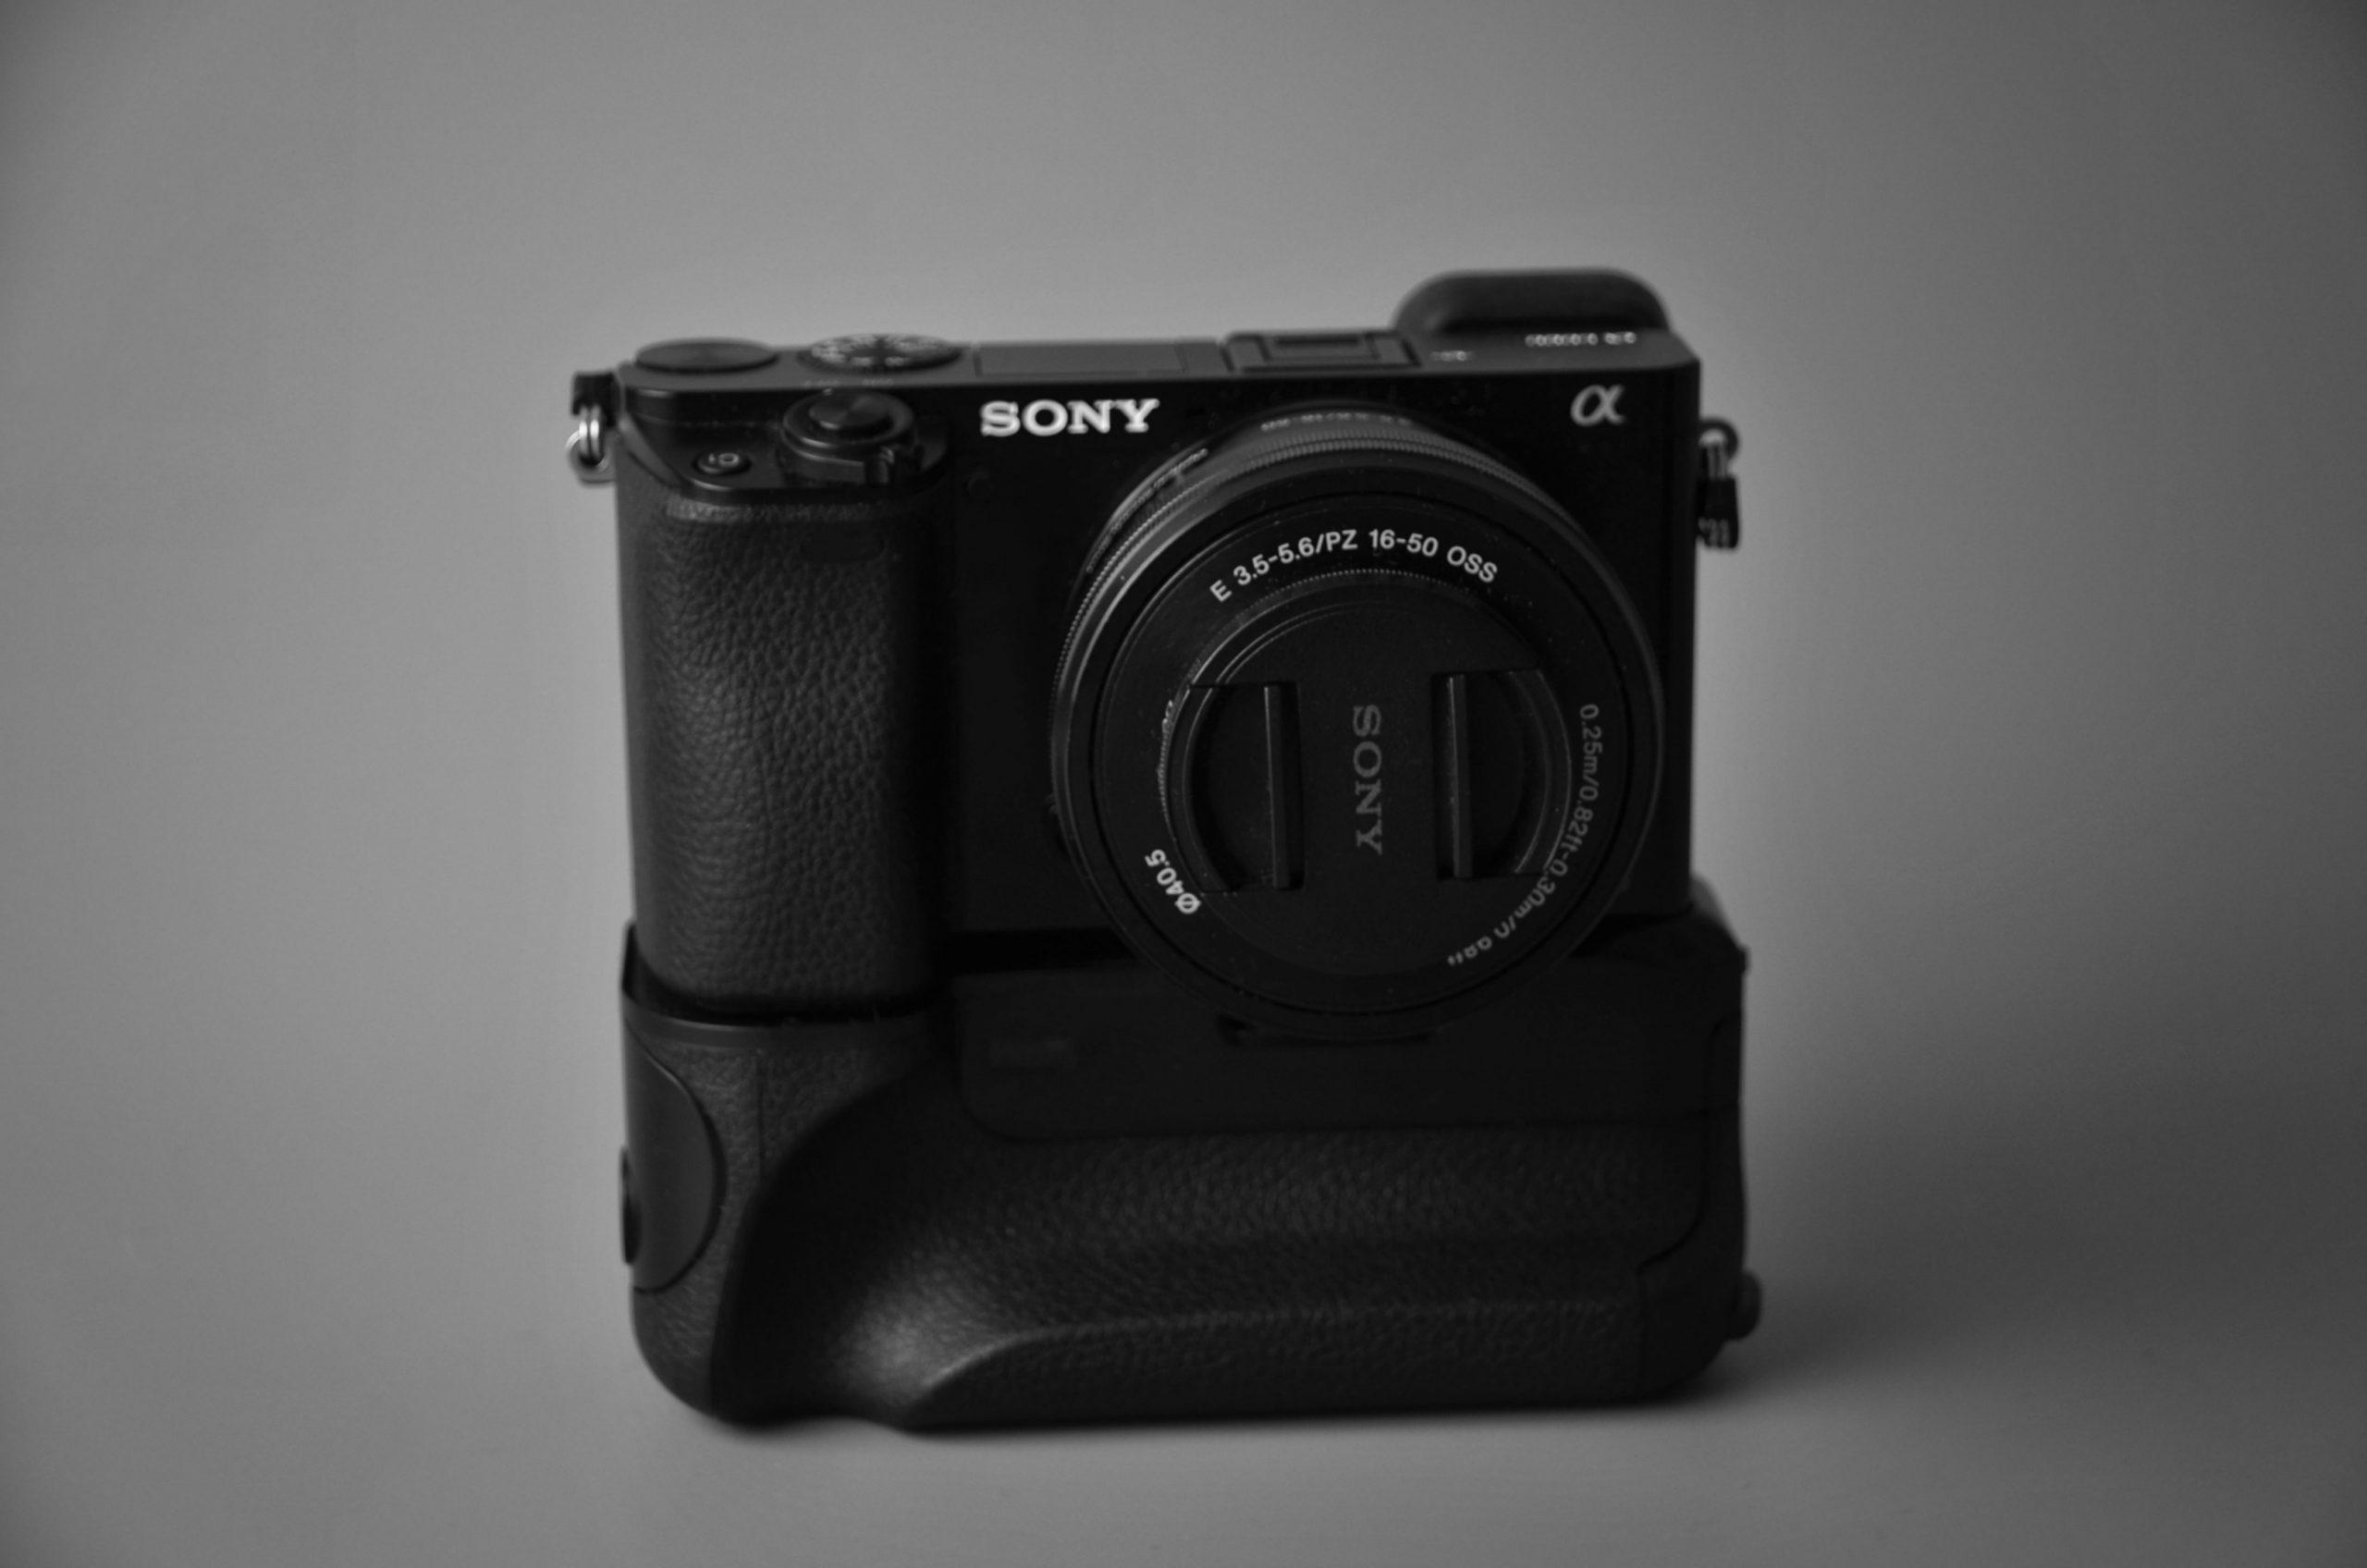 Sony D800